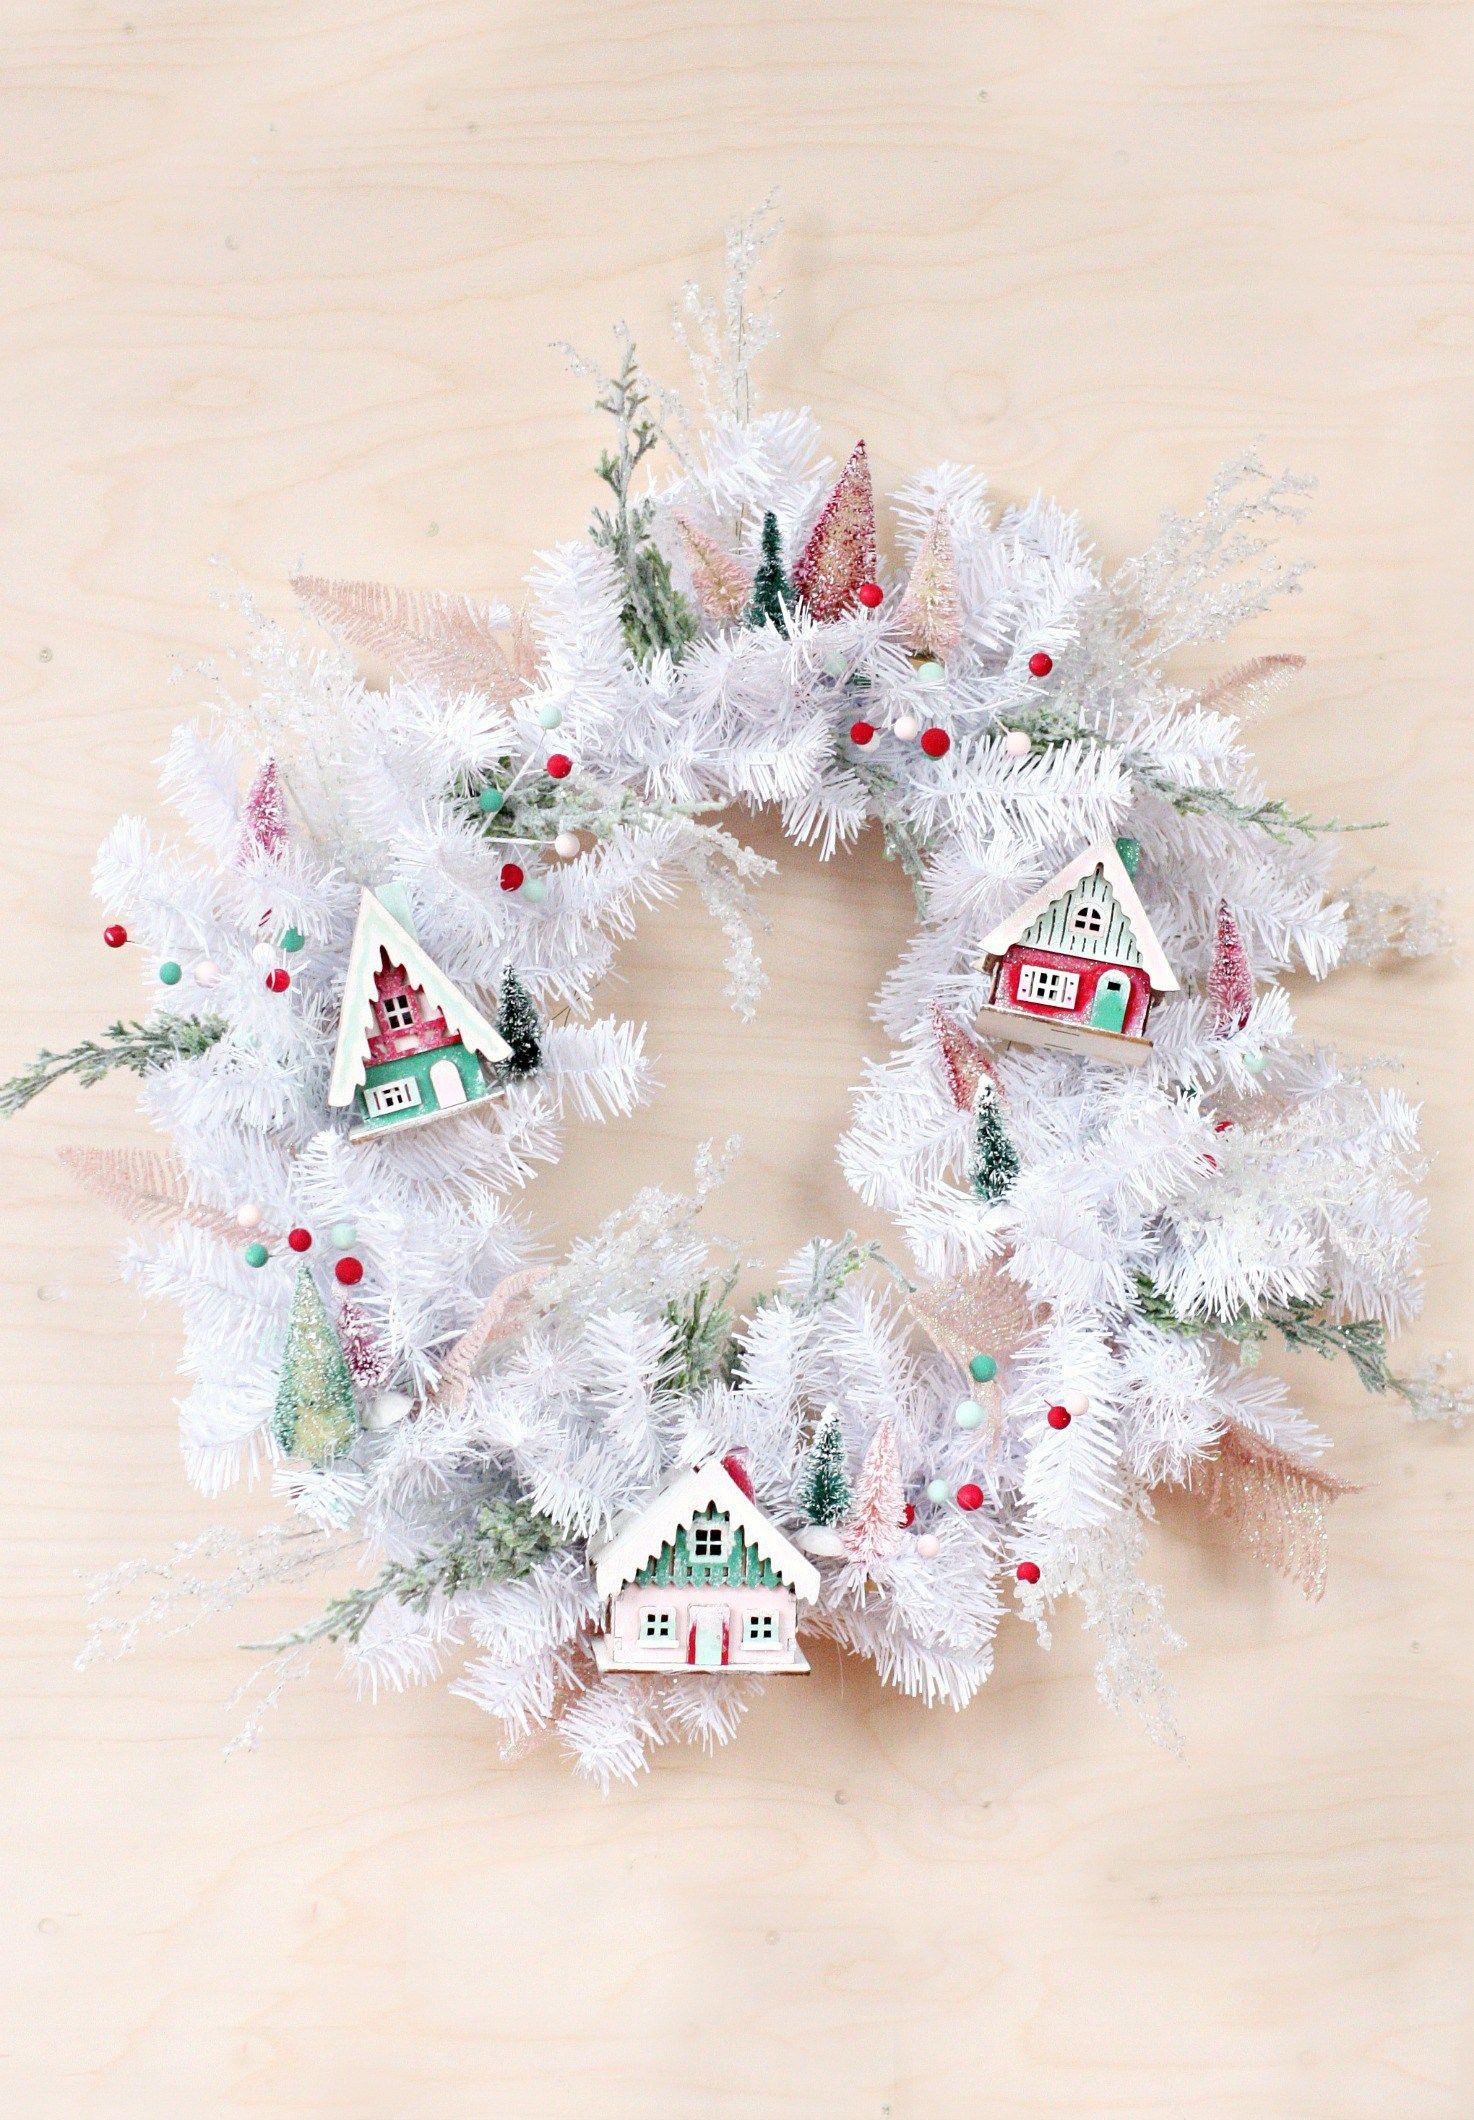 DIY Winter Decor  Christmas Door Decorations Start The Winter Celebrations Early